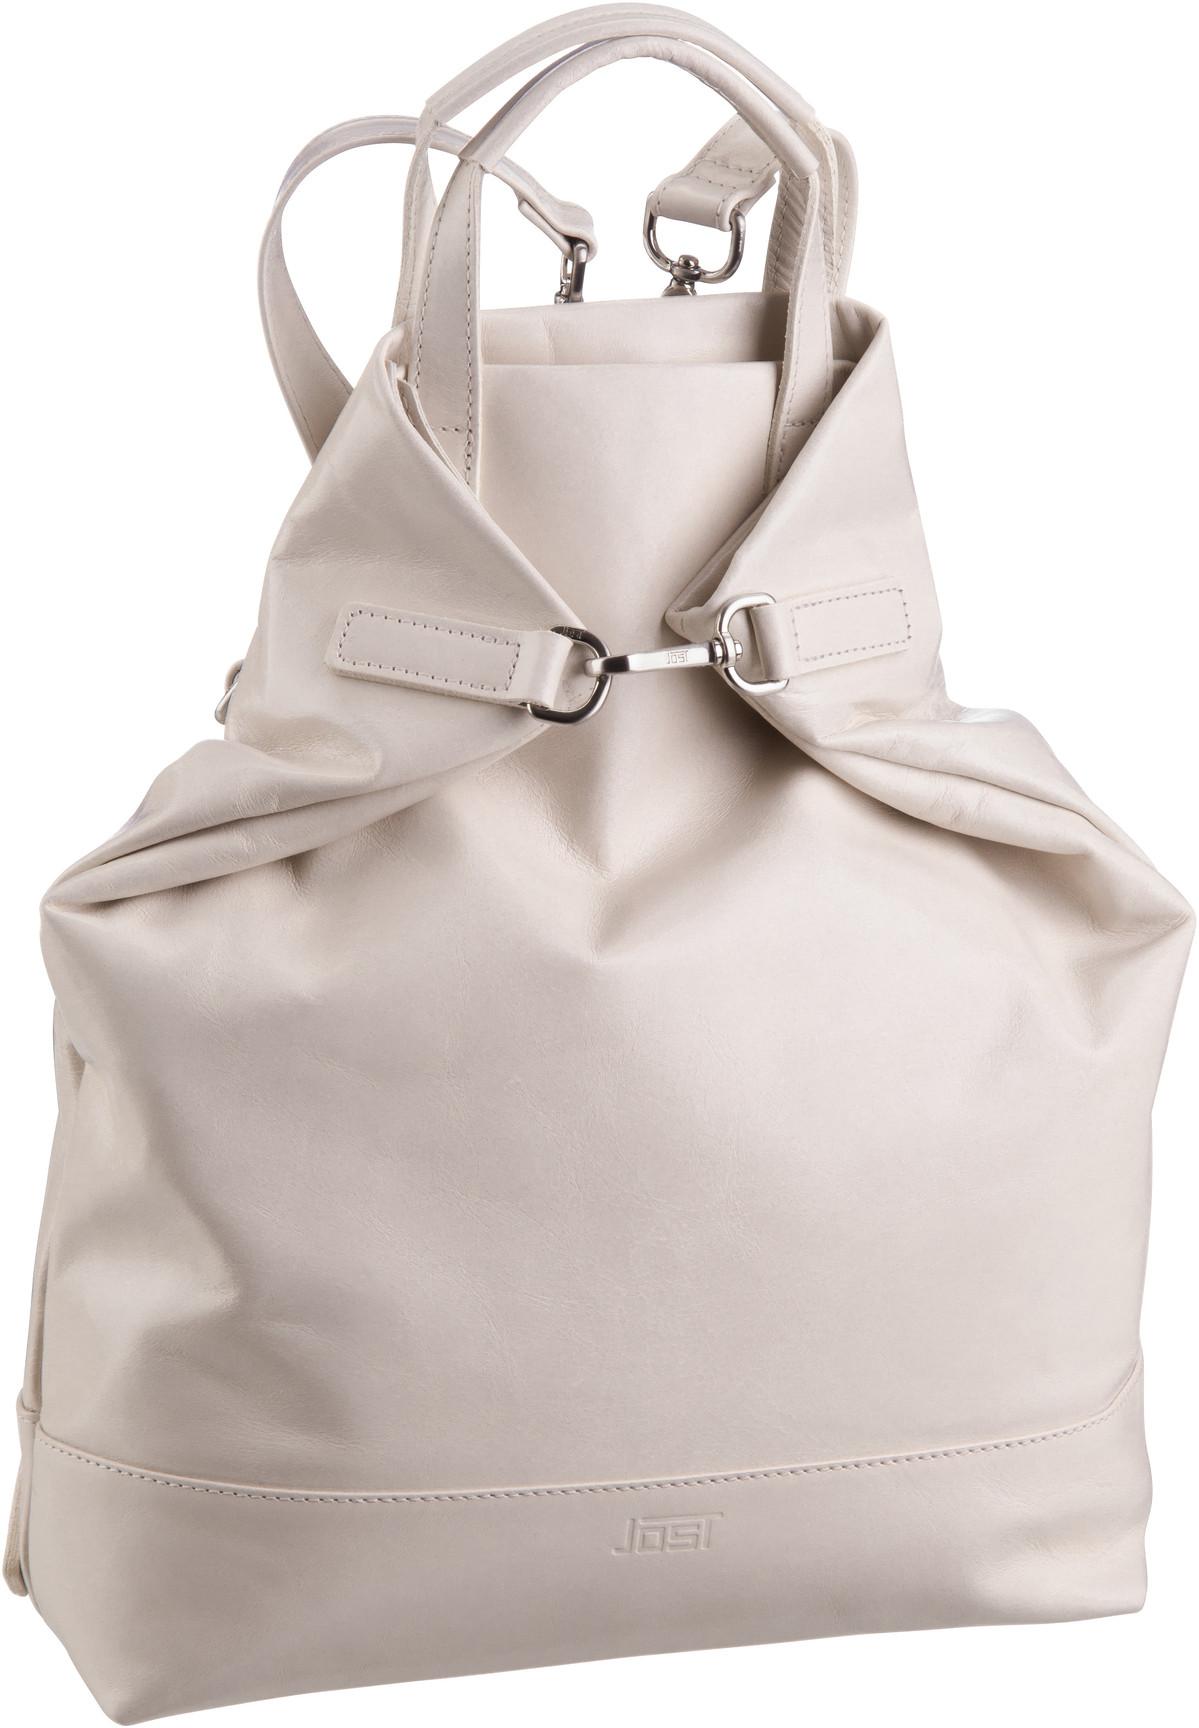 Rucksack / Daypack Boda 6625 X-Change Bag S Offwhite